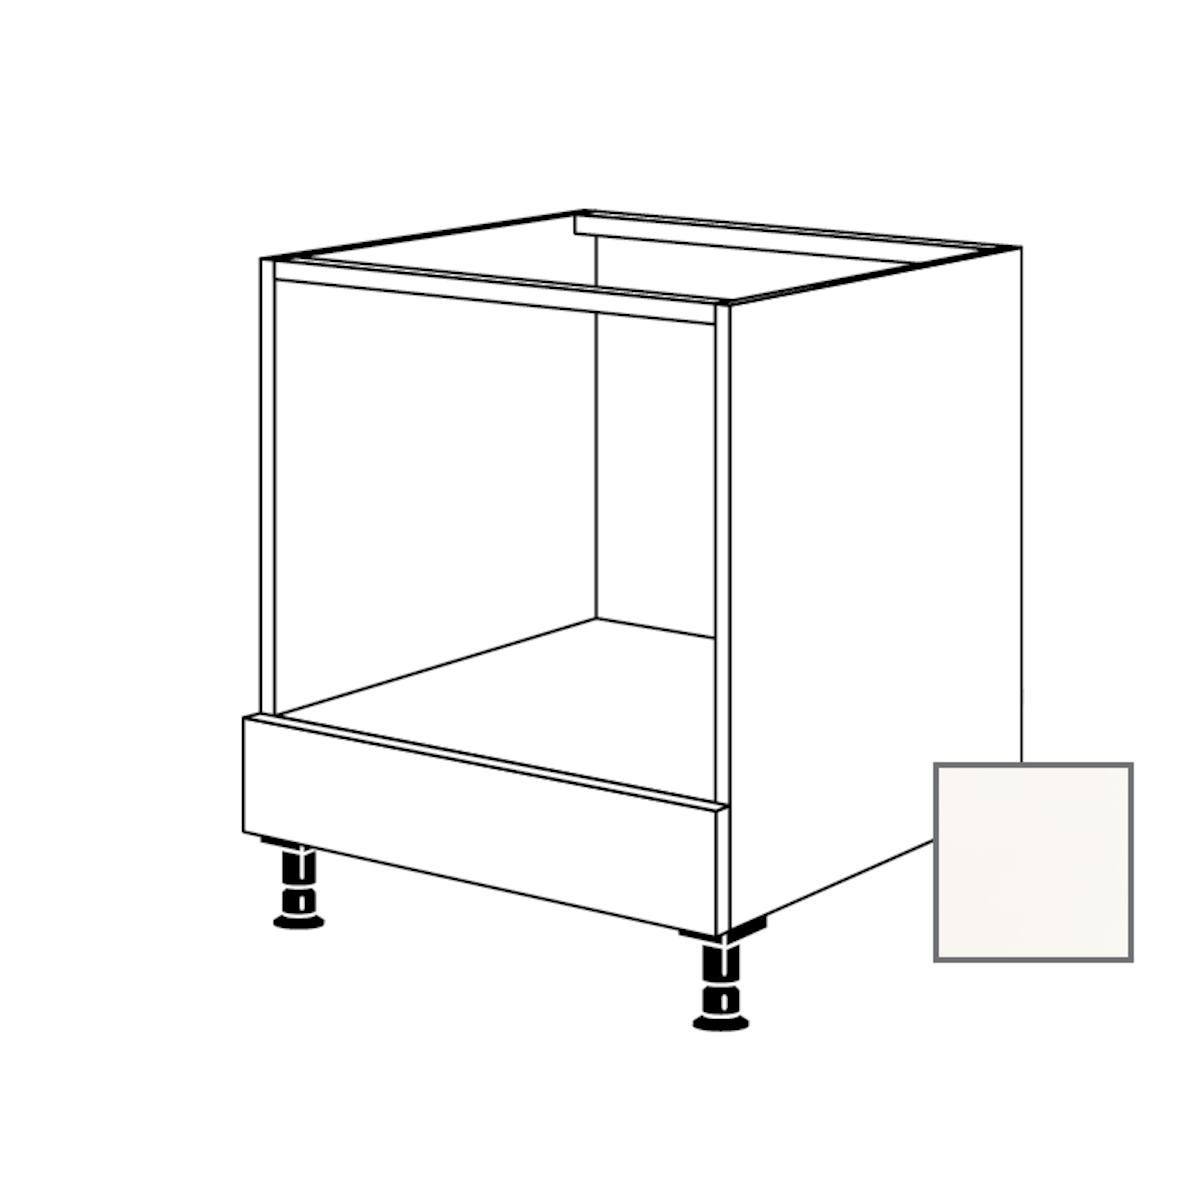 Kuchynská skrinka spodní Naturel Erika24 pre rúru 60x87x56 cm bílá lesk 450.HUB